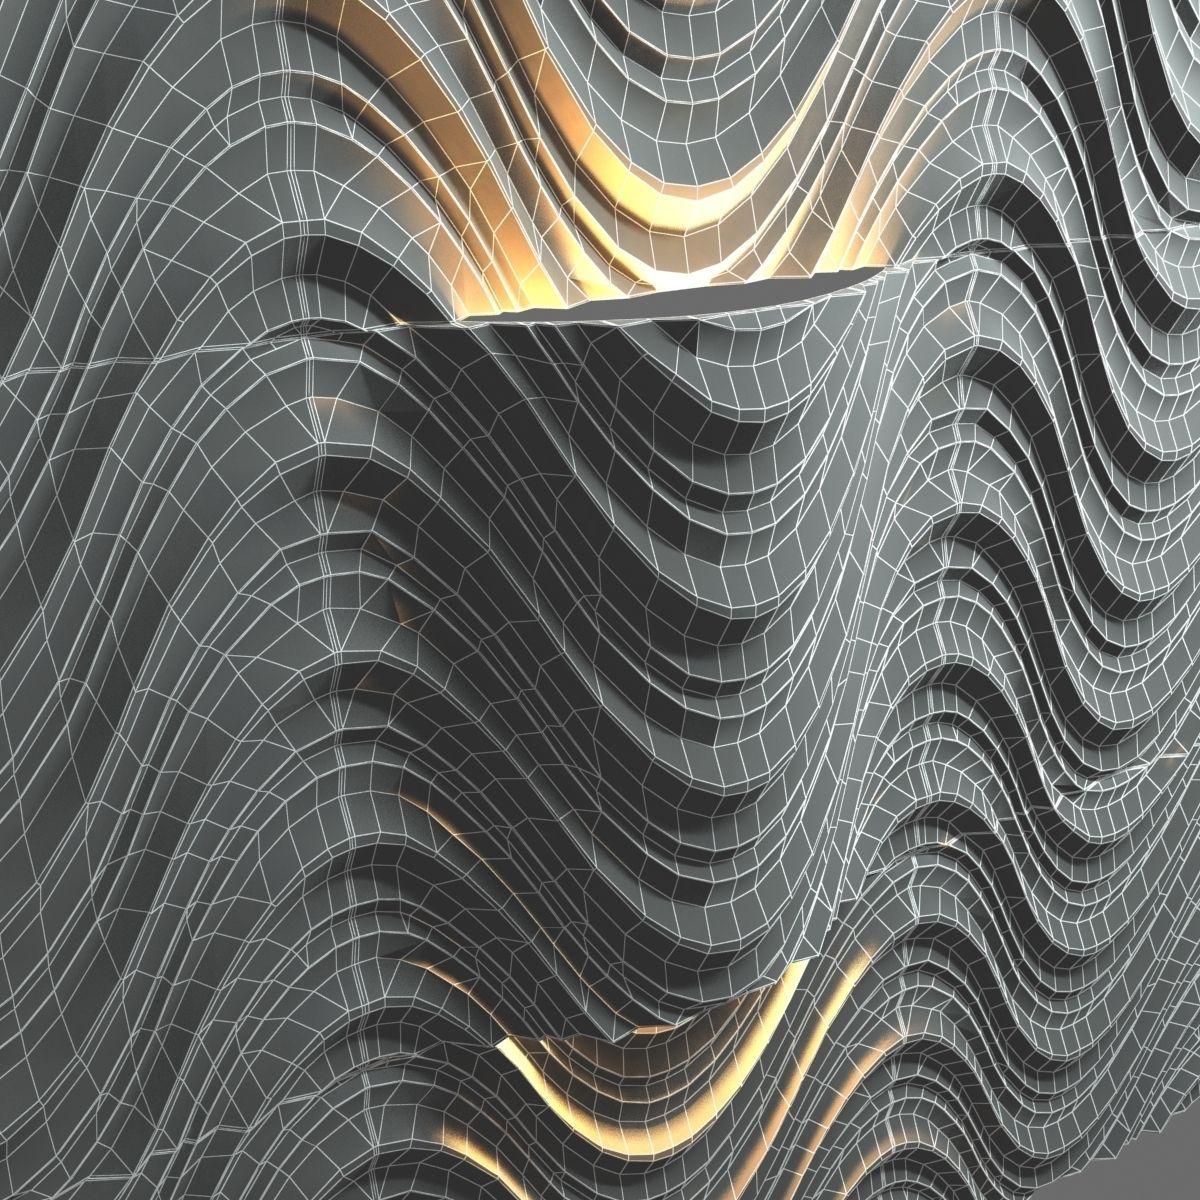 Lithos design seta 3d wall tiles 3d model max obj 3ds fbx for 3d outdoor wall tiles